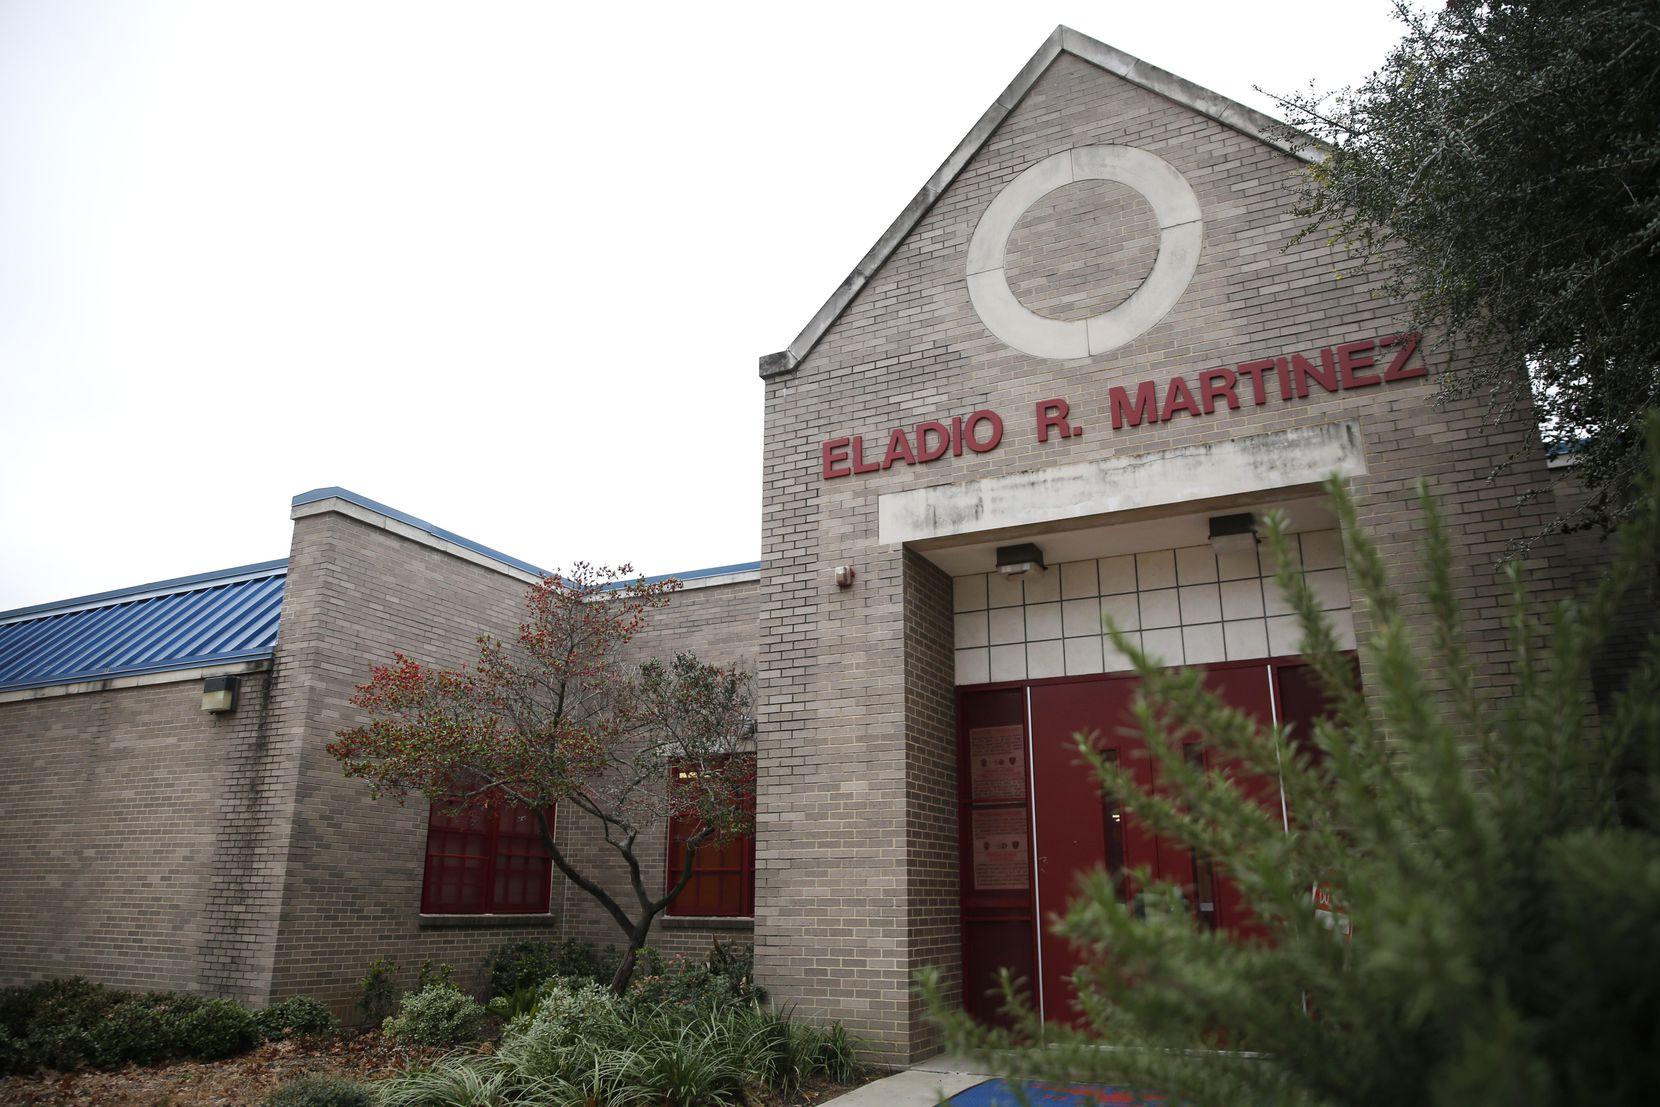 Vista exterior del Eladio R. Martinez Learning Center en Dallas. ROSE BACA/DMN